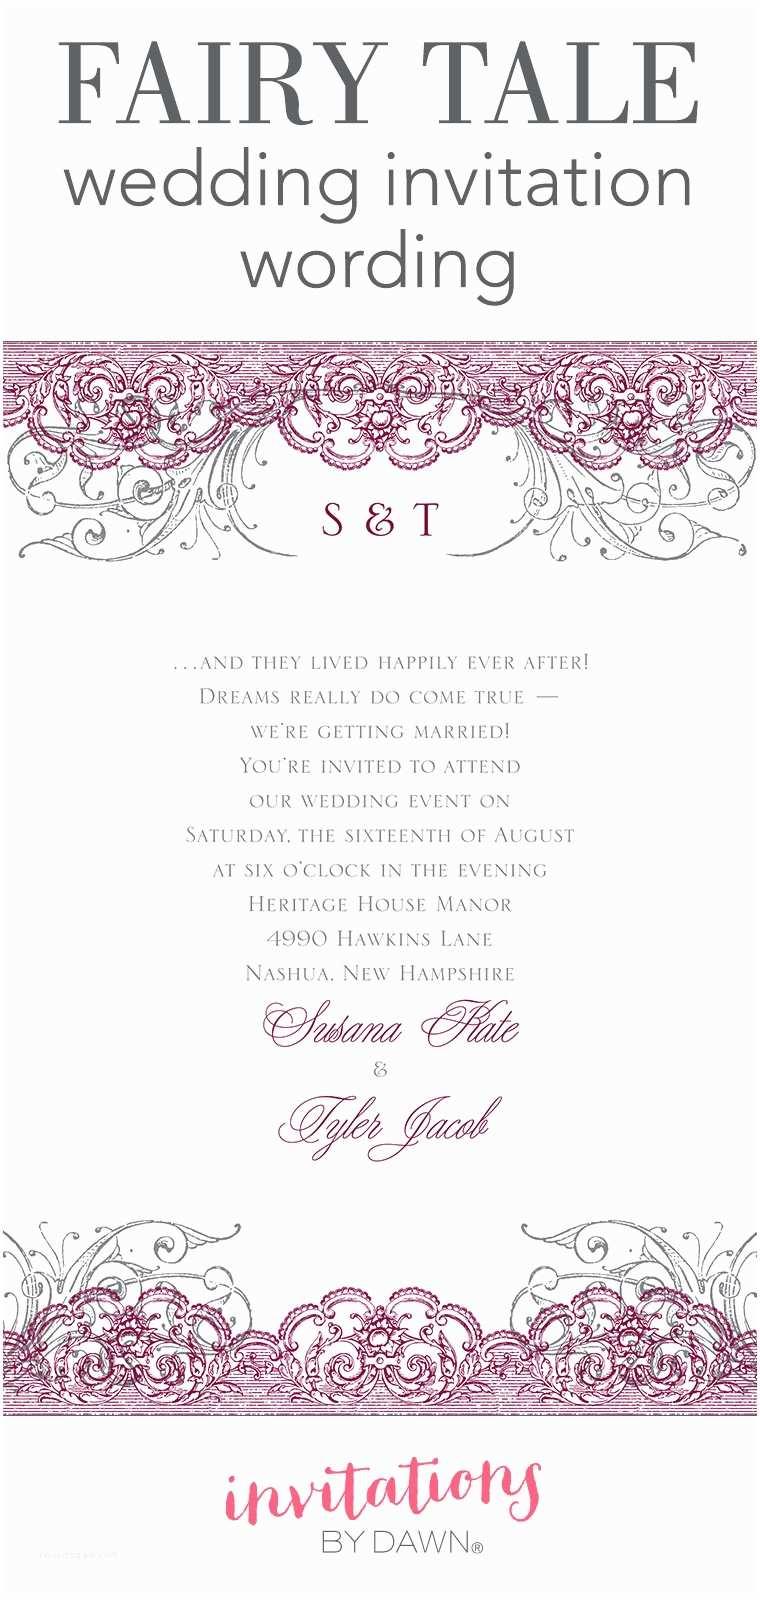 Wedding Invitation format Fairy Tale Wedding Invitation Wording